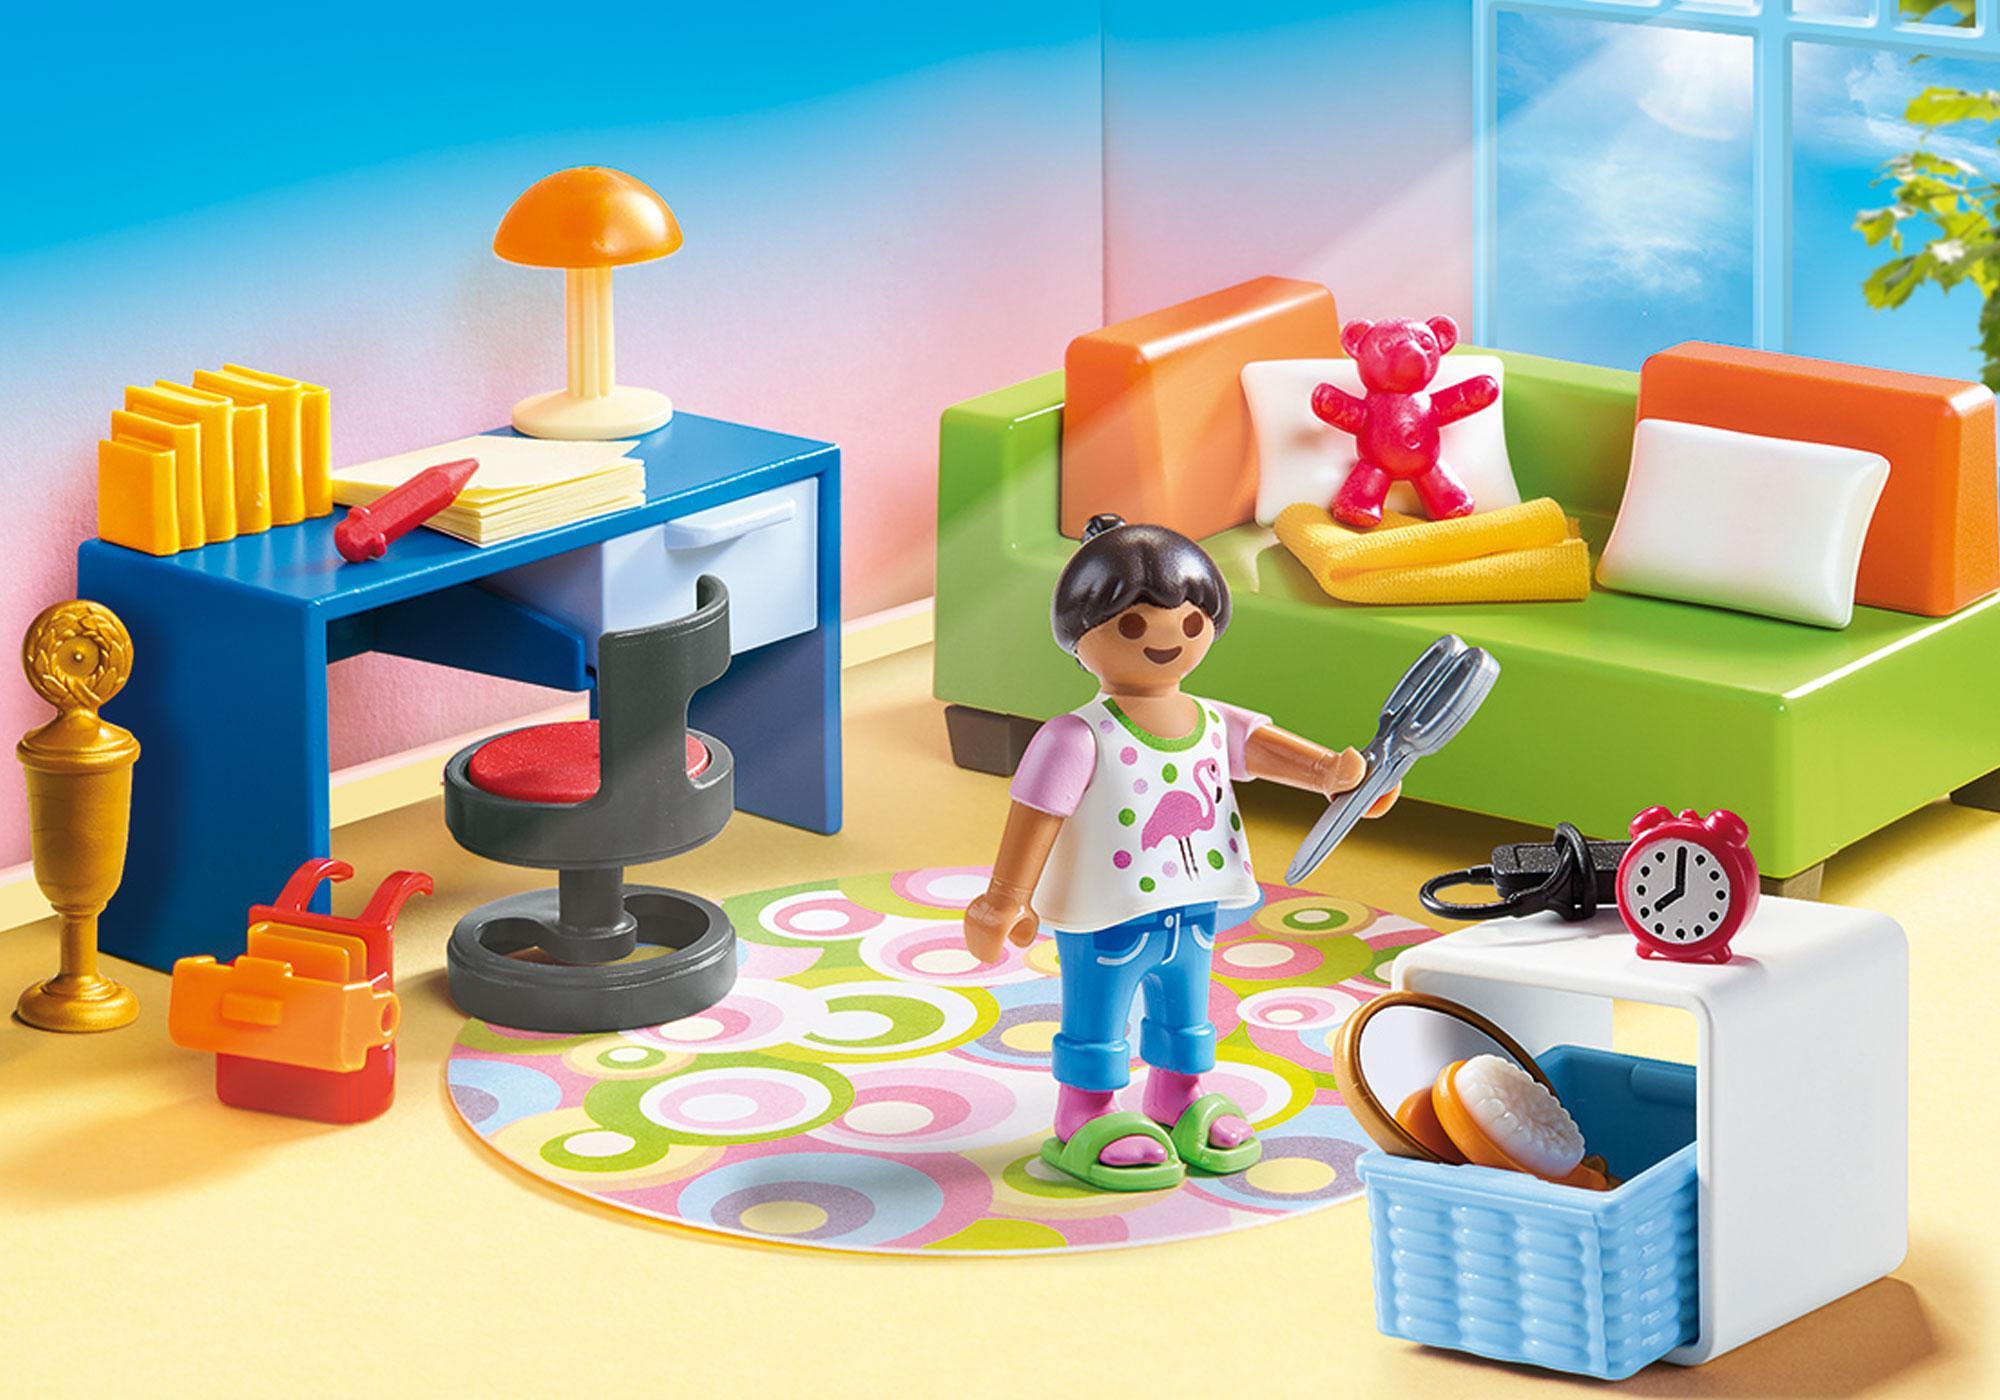 http://media.playmobil.com/i/playmobil/70209_product_detail/Chambre d'enfant avec canapé-lit